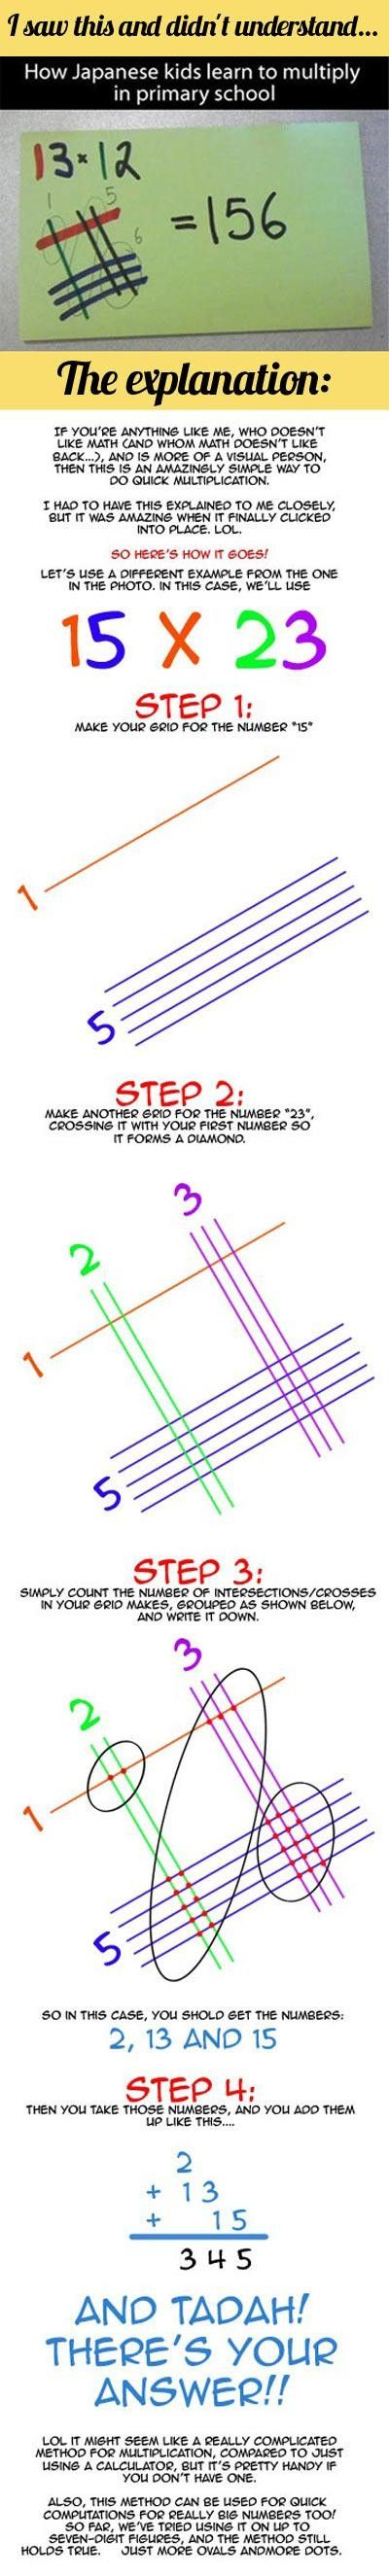 finally and explanation math math multiplication japanese kids. Black Bedroom Furniture Sets. Home Design Ideas